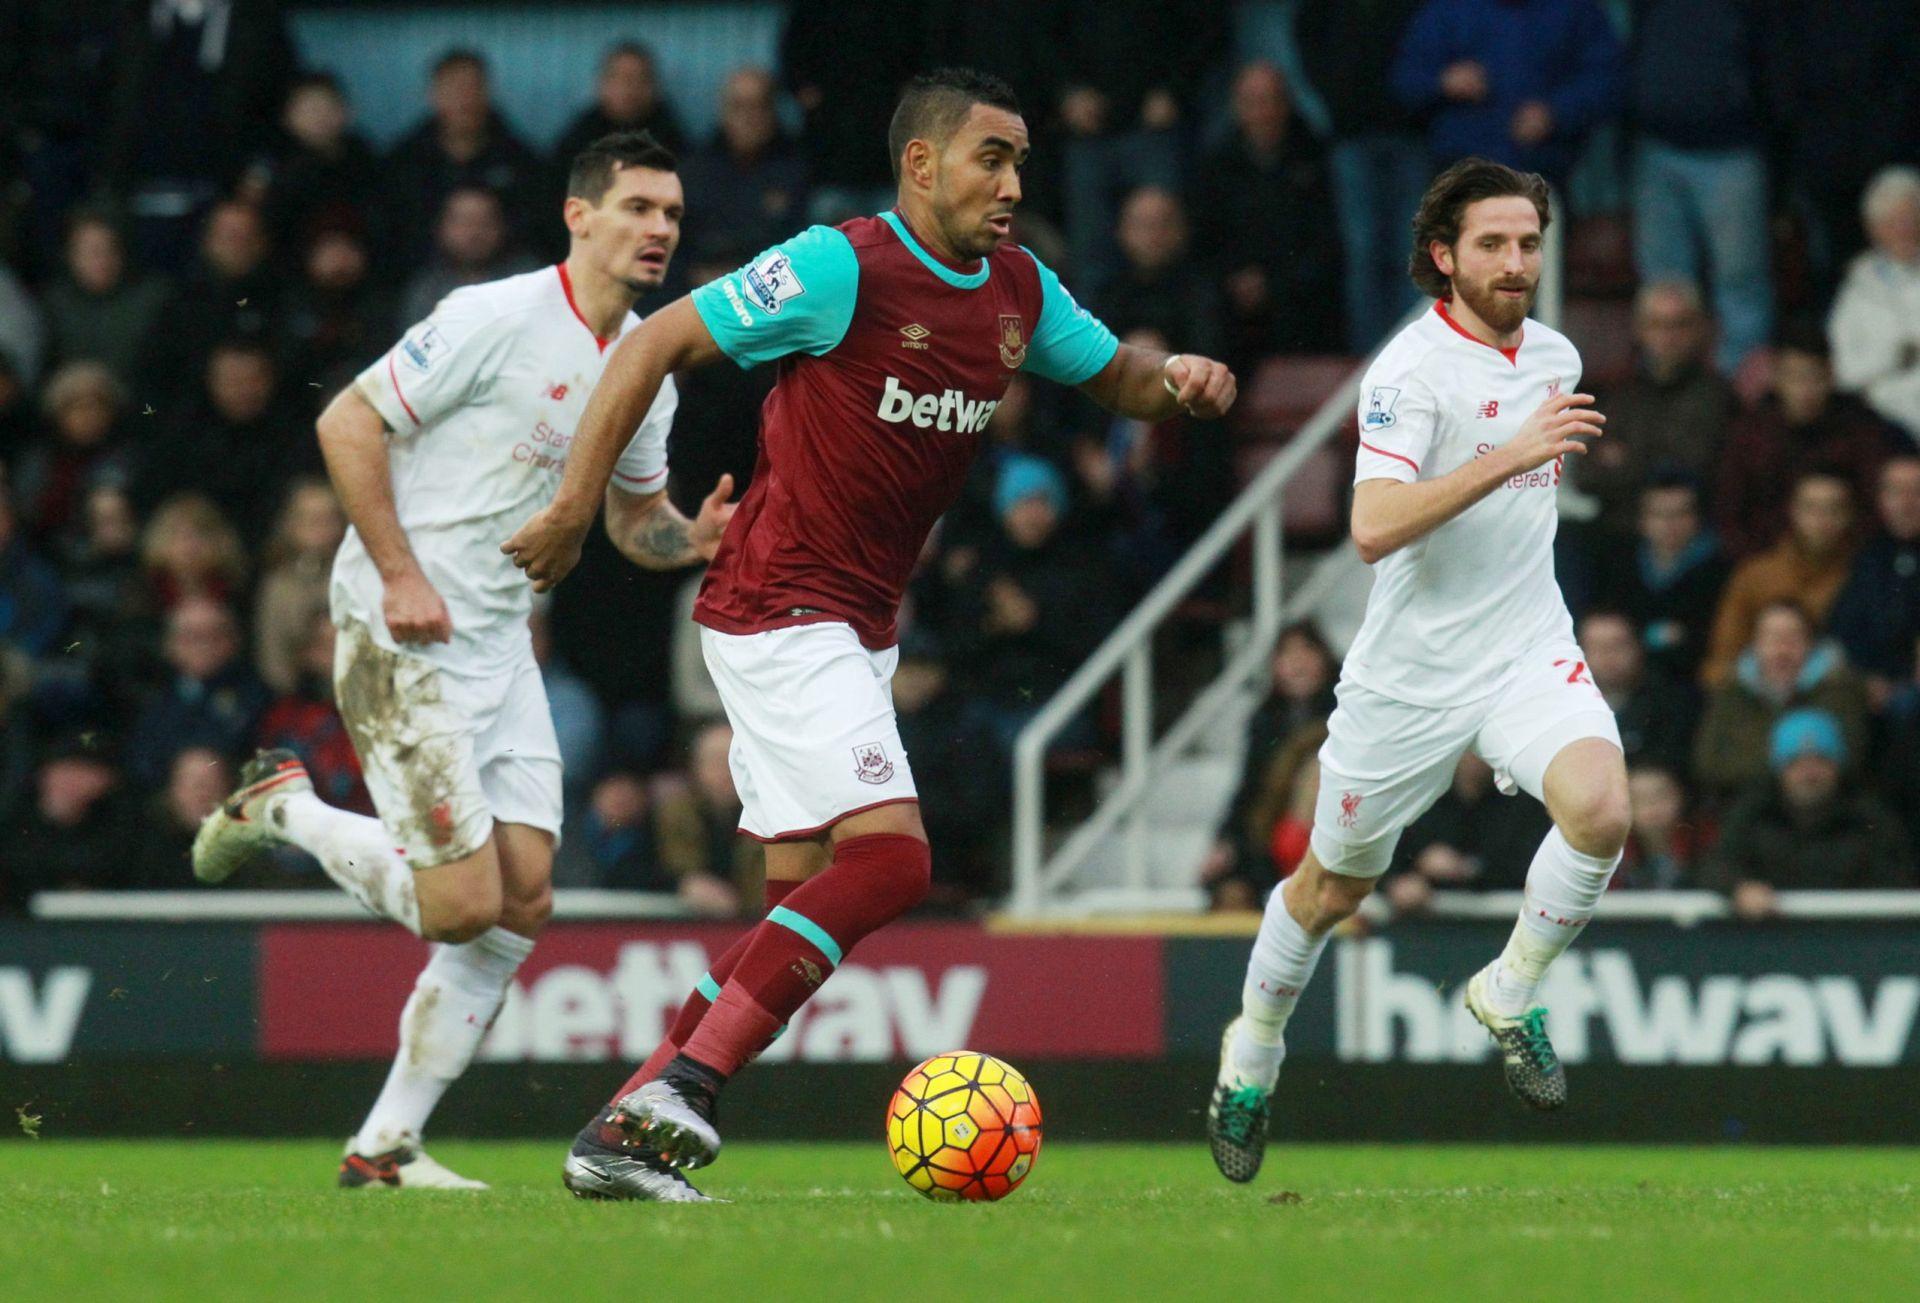 West Ham pristao prodati Payeta